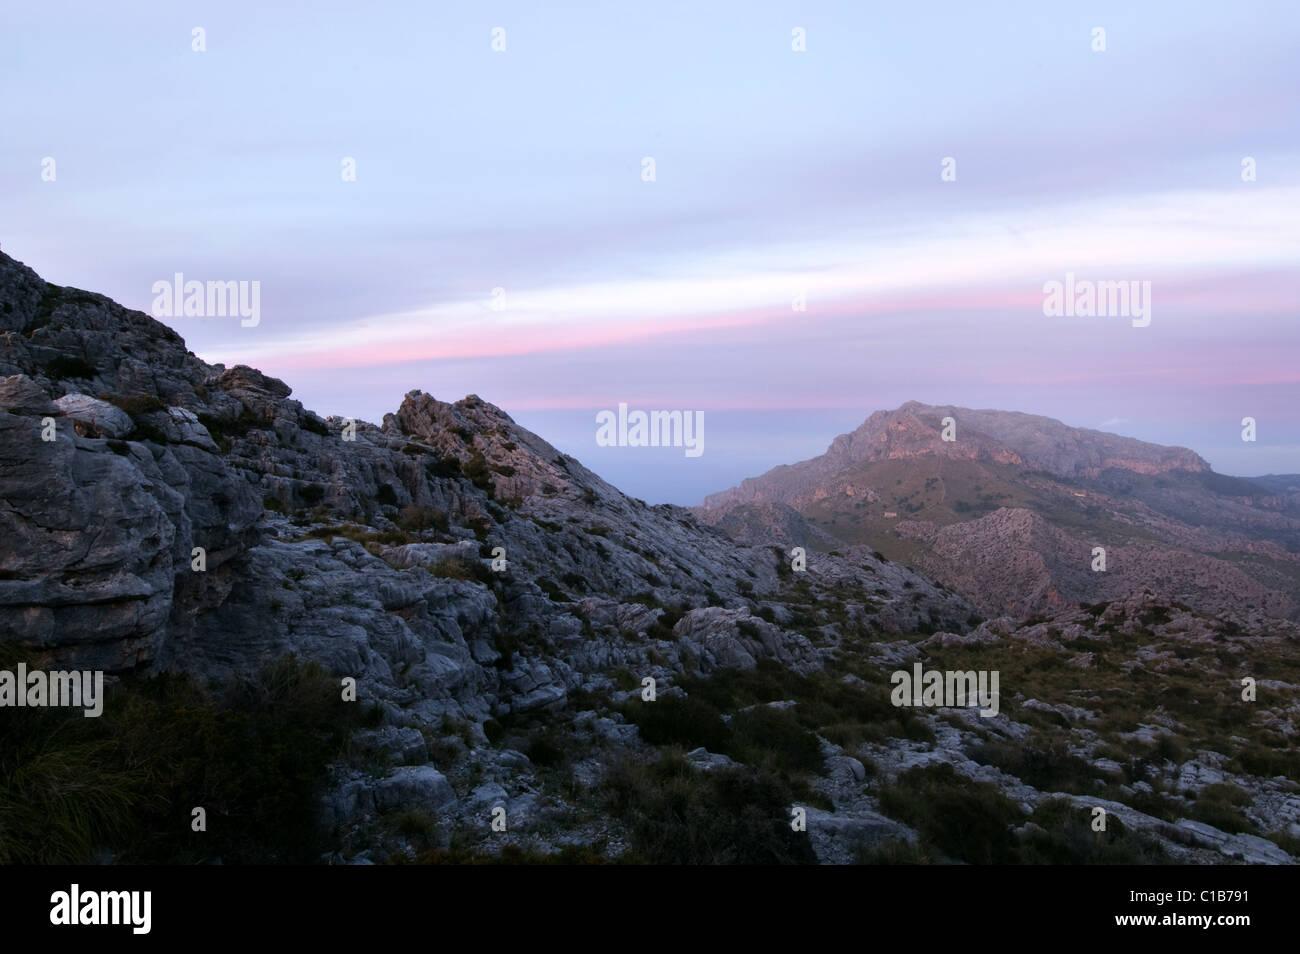 on way to Sa Calobra with view to Puig Roig,Serra de Tramuntana, Mallorca, Spain, 2011 - Stock Image